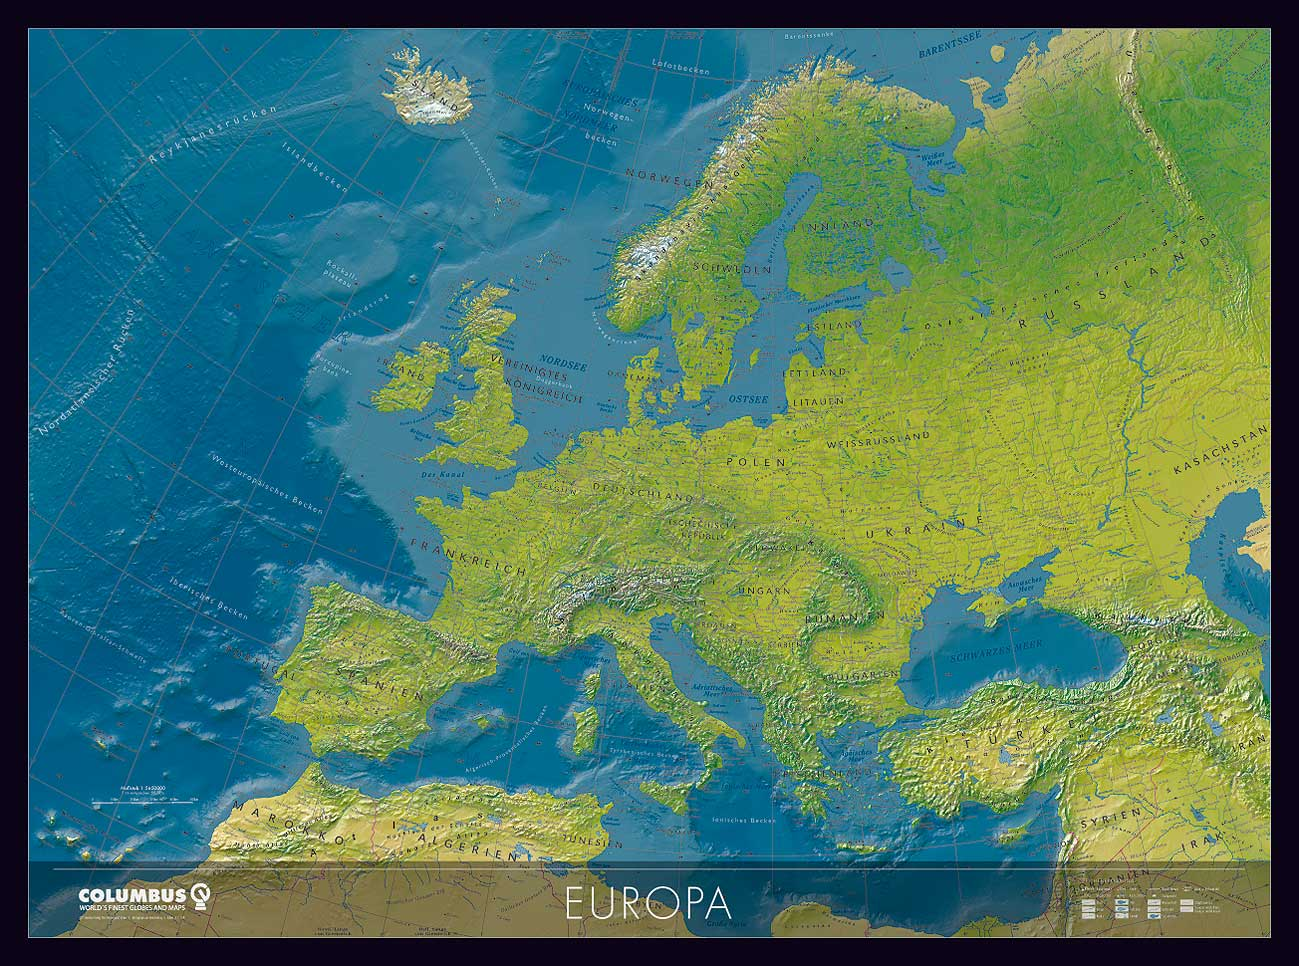 Europa Karte Physisch.Europa Karte Oder Europa Karte Oder Europa Landkarte